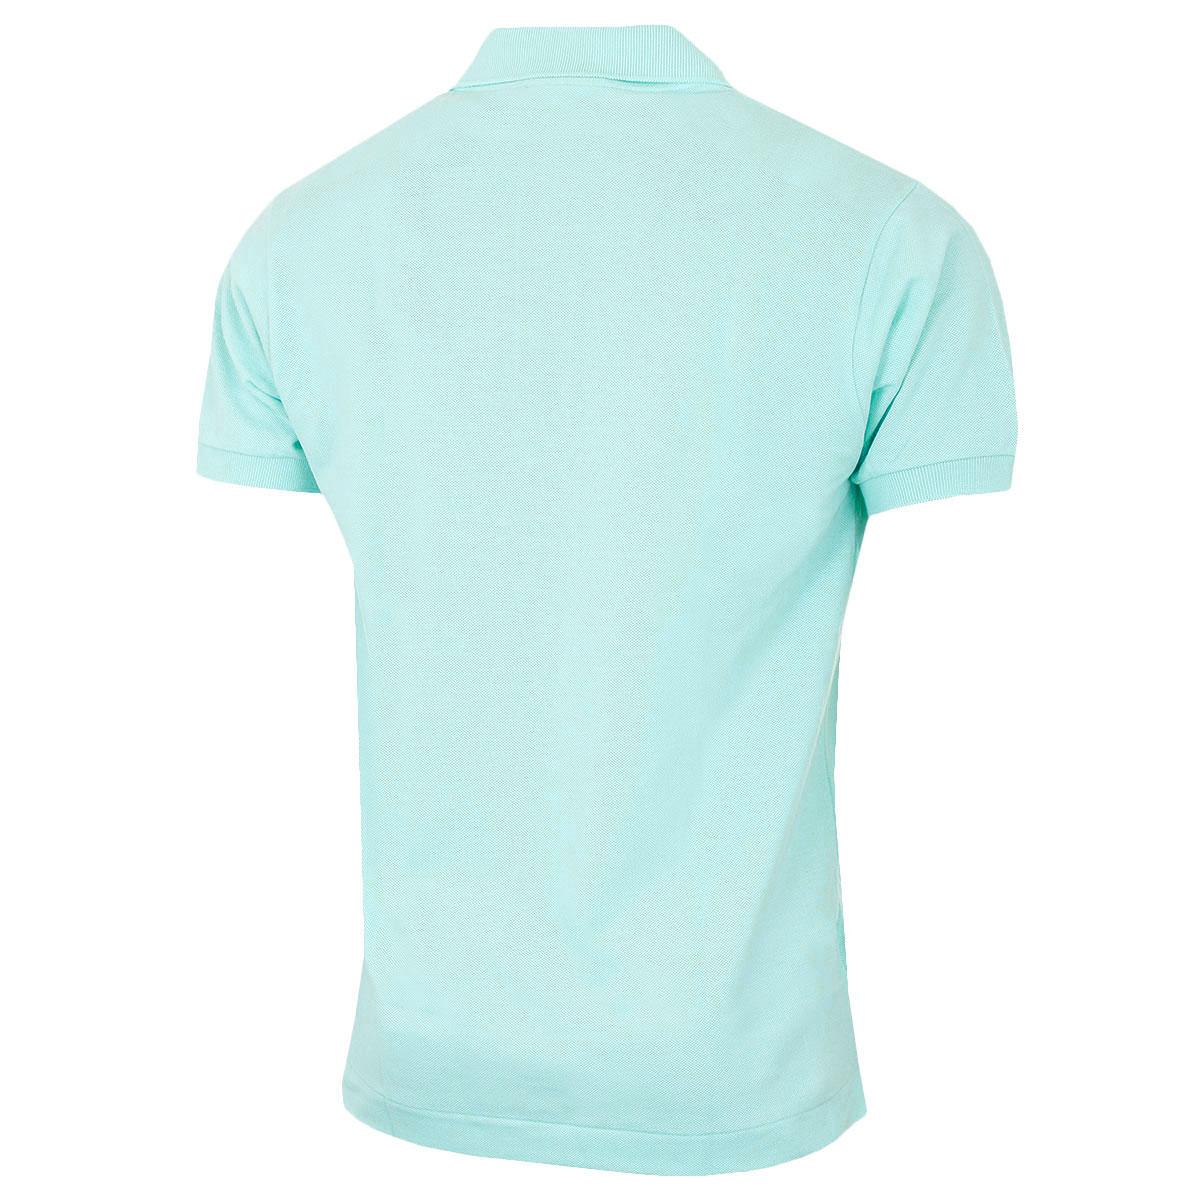 Lacoste-Mens-Classic-Cotton-L1212-Short-Sleeve-Polo-Shirt-26-OFF-RRP thumbnail 11